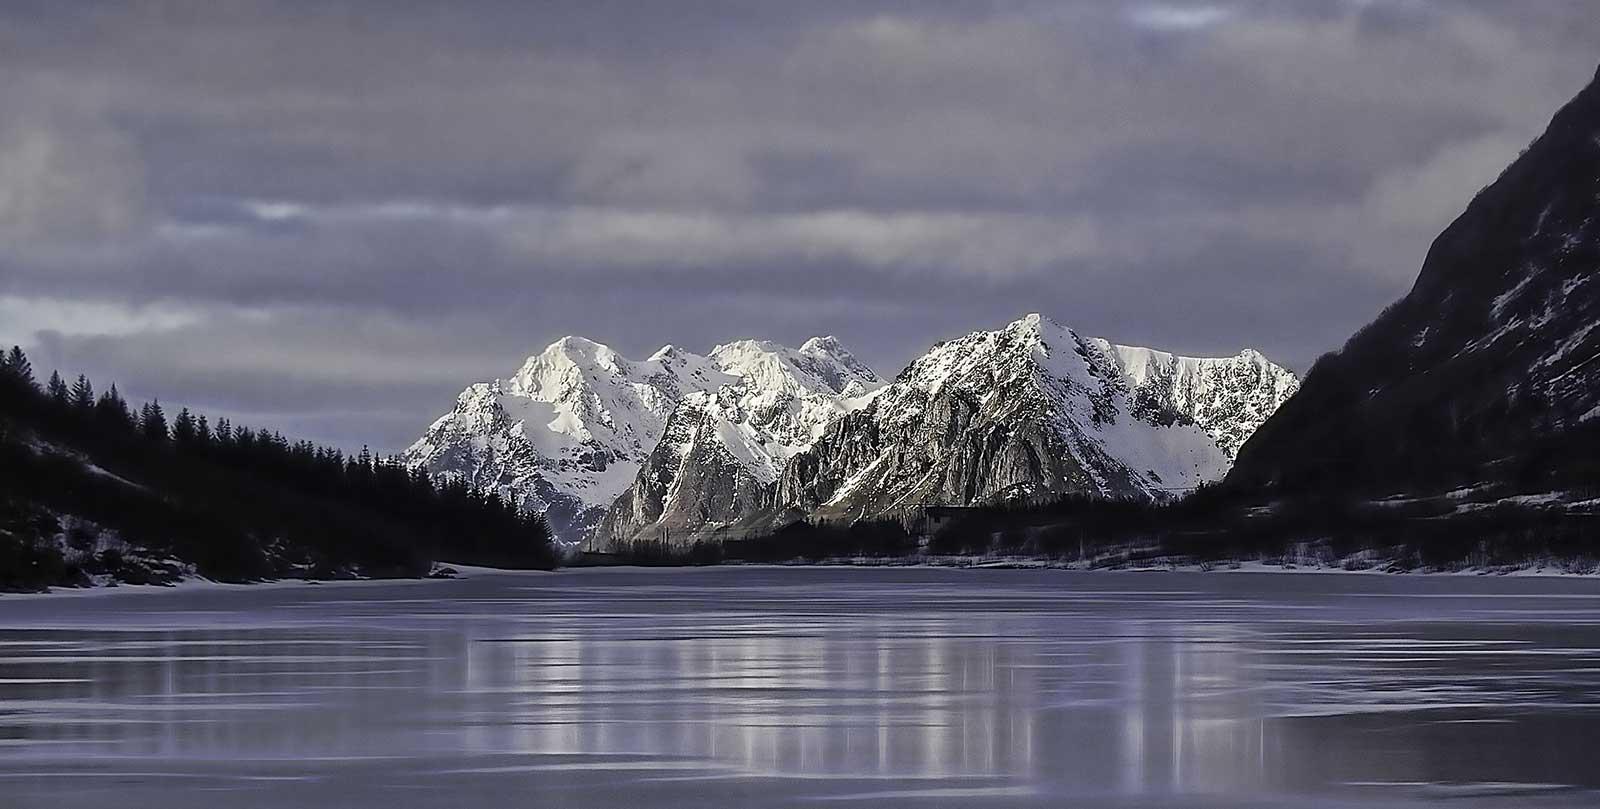 isole lofoten norvegia